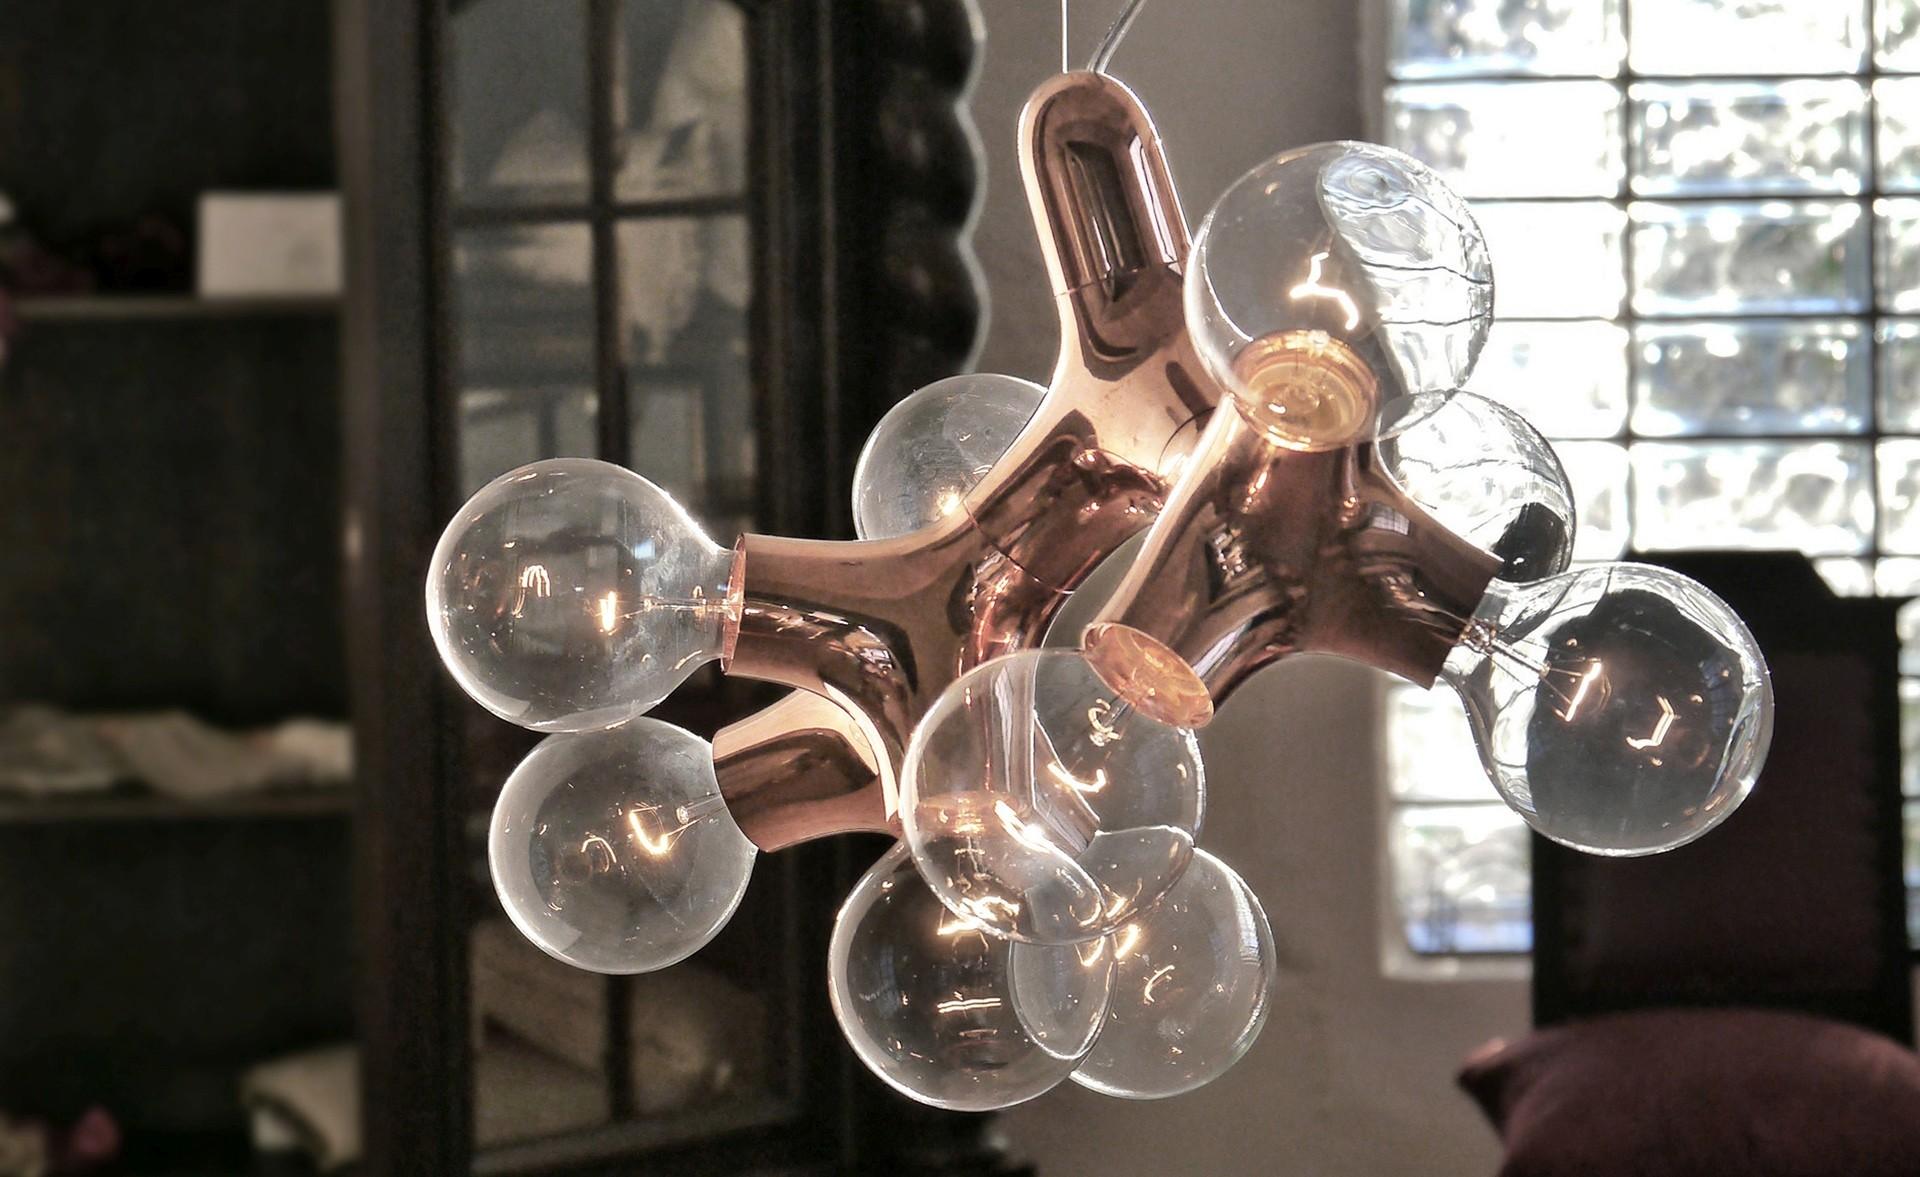 Next Design Hanglamp DNA 0,1,2 - Koper